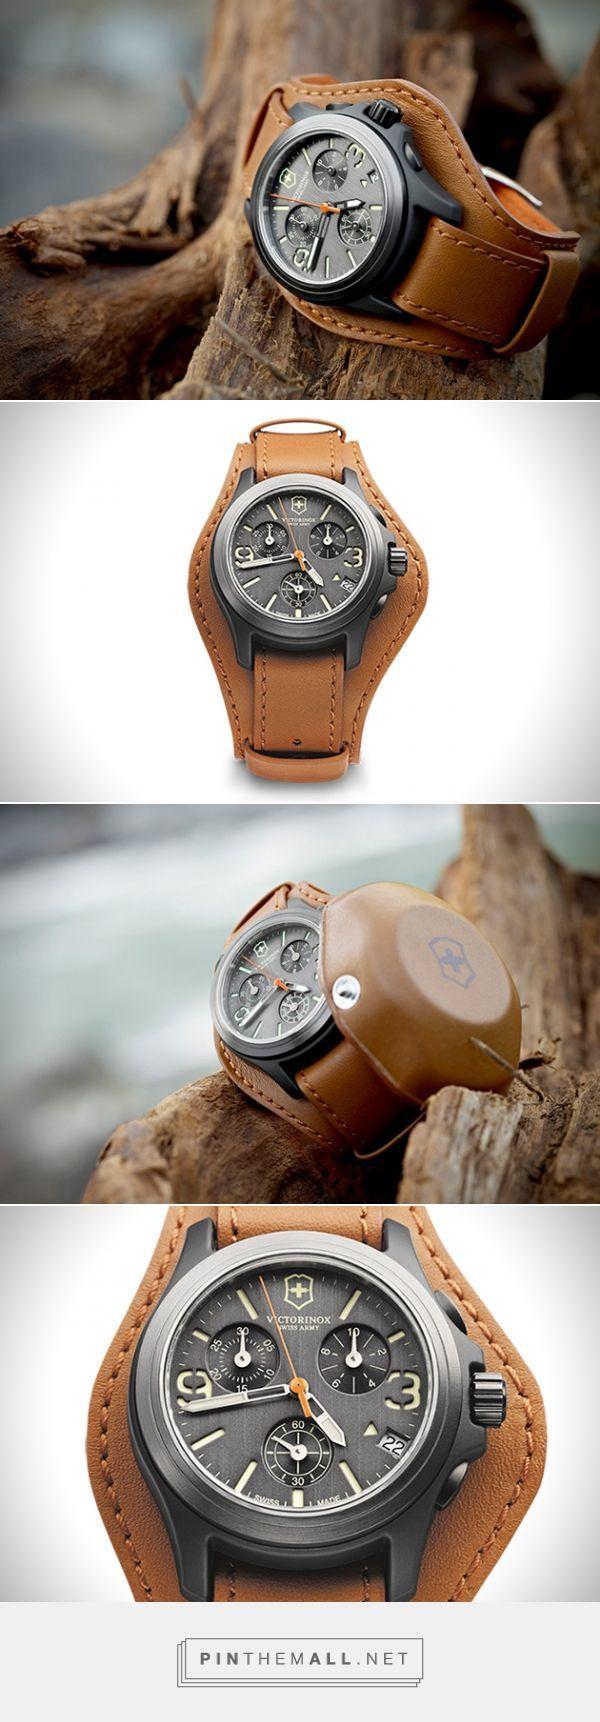 Gift idea: Victorino Gift idea: Victorinox Swiss Army Original Watch   $279 on sale from Amazon #holidaygifts #spon #timepiece